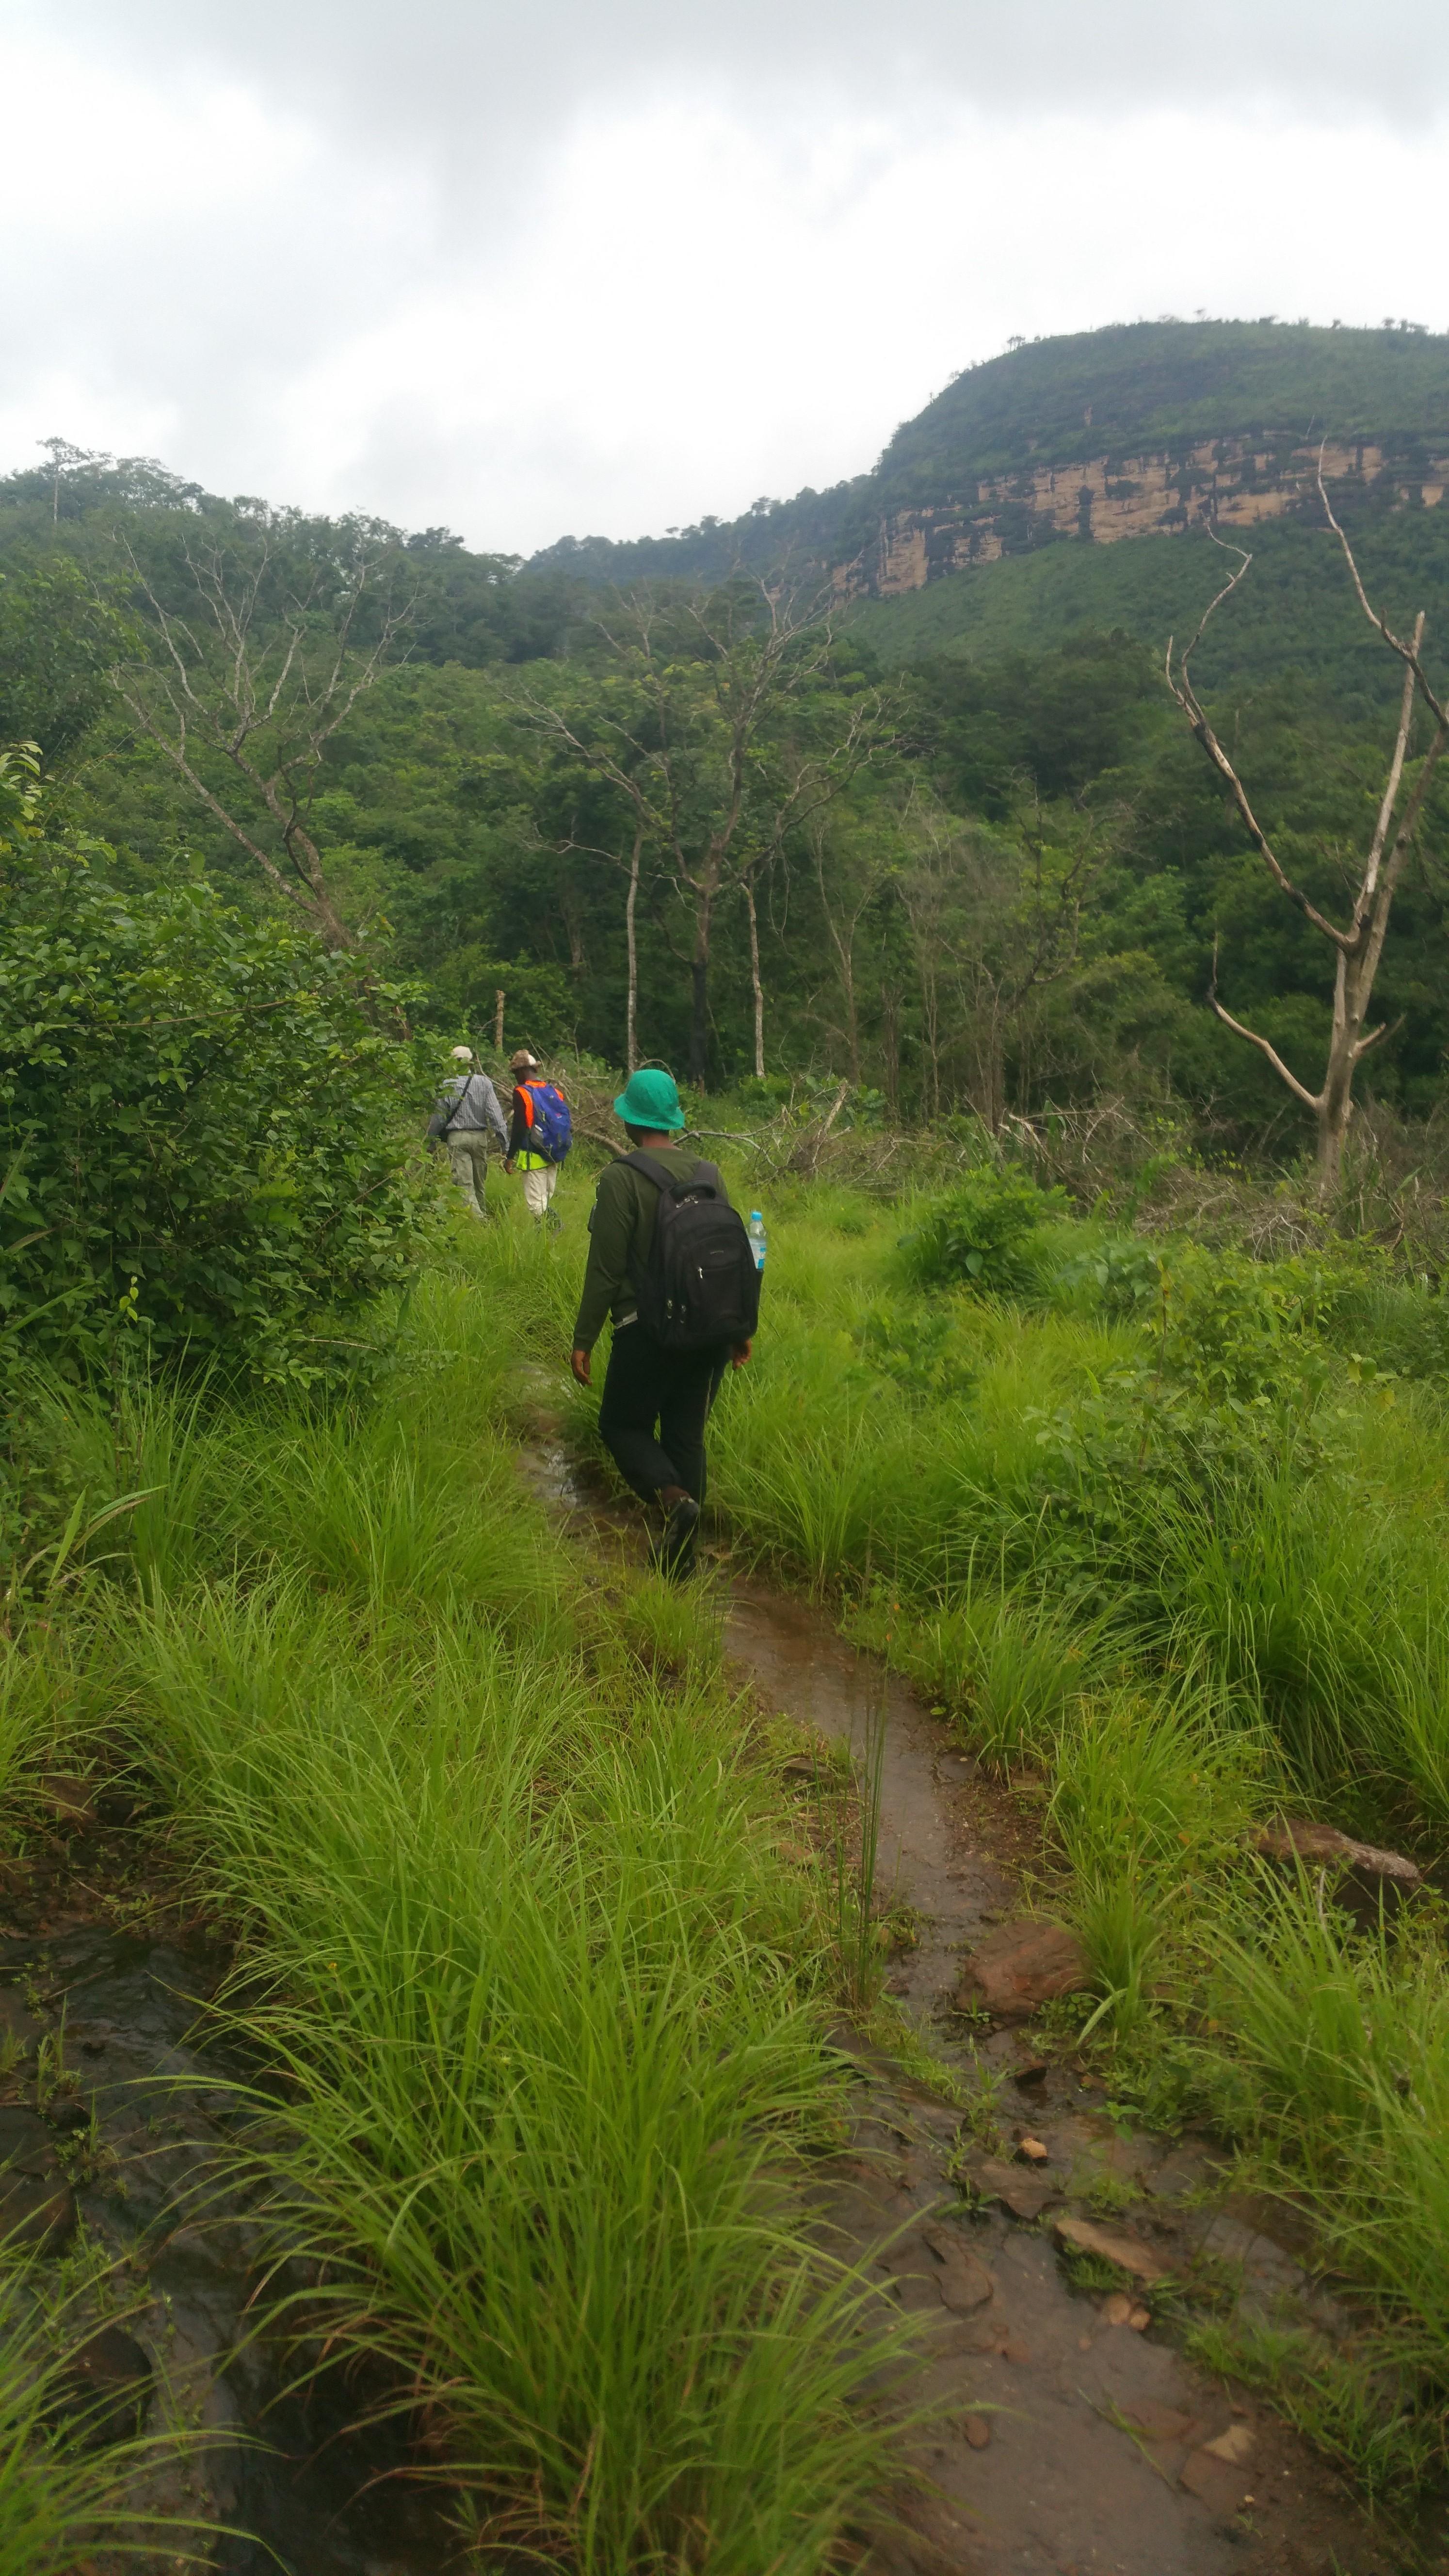 Entering Kakiwondi forest from the Kaporo side. Photo: © C. Couch, RBG Kew